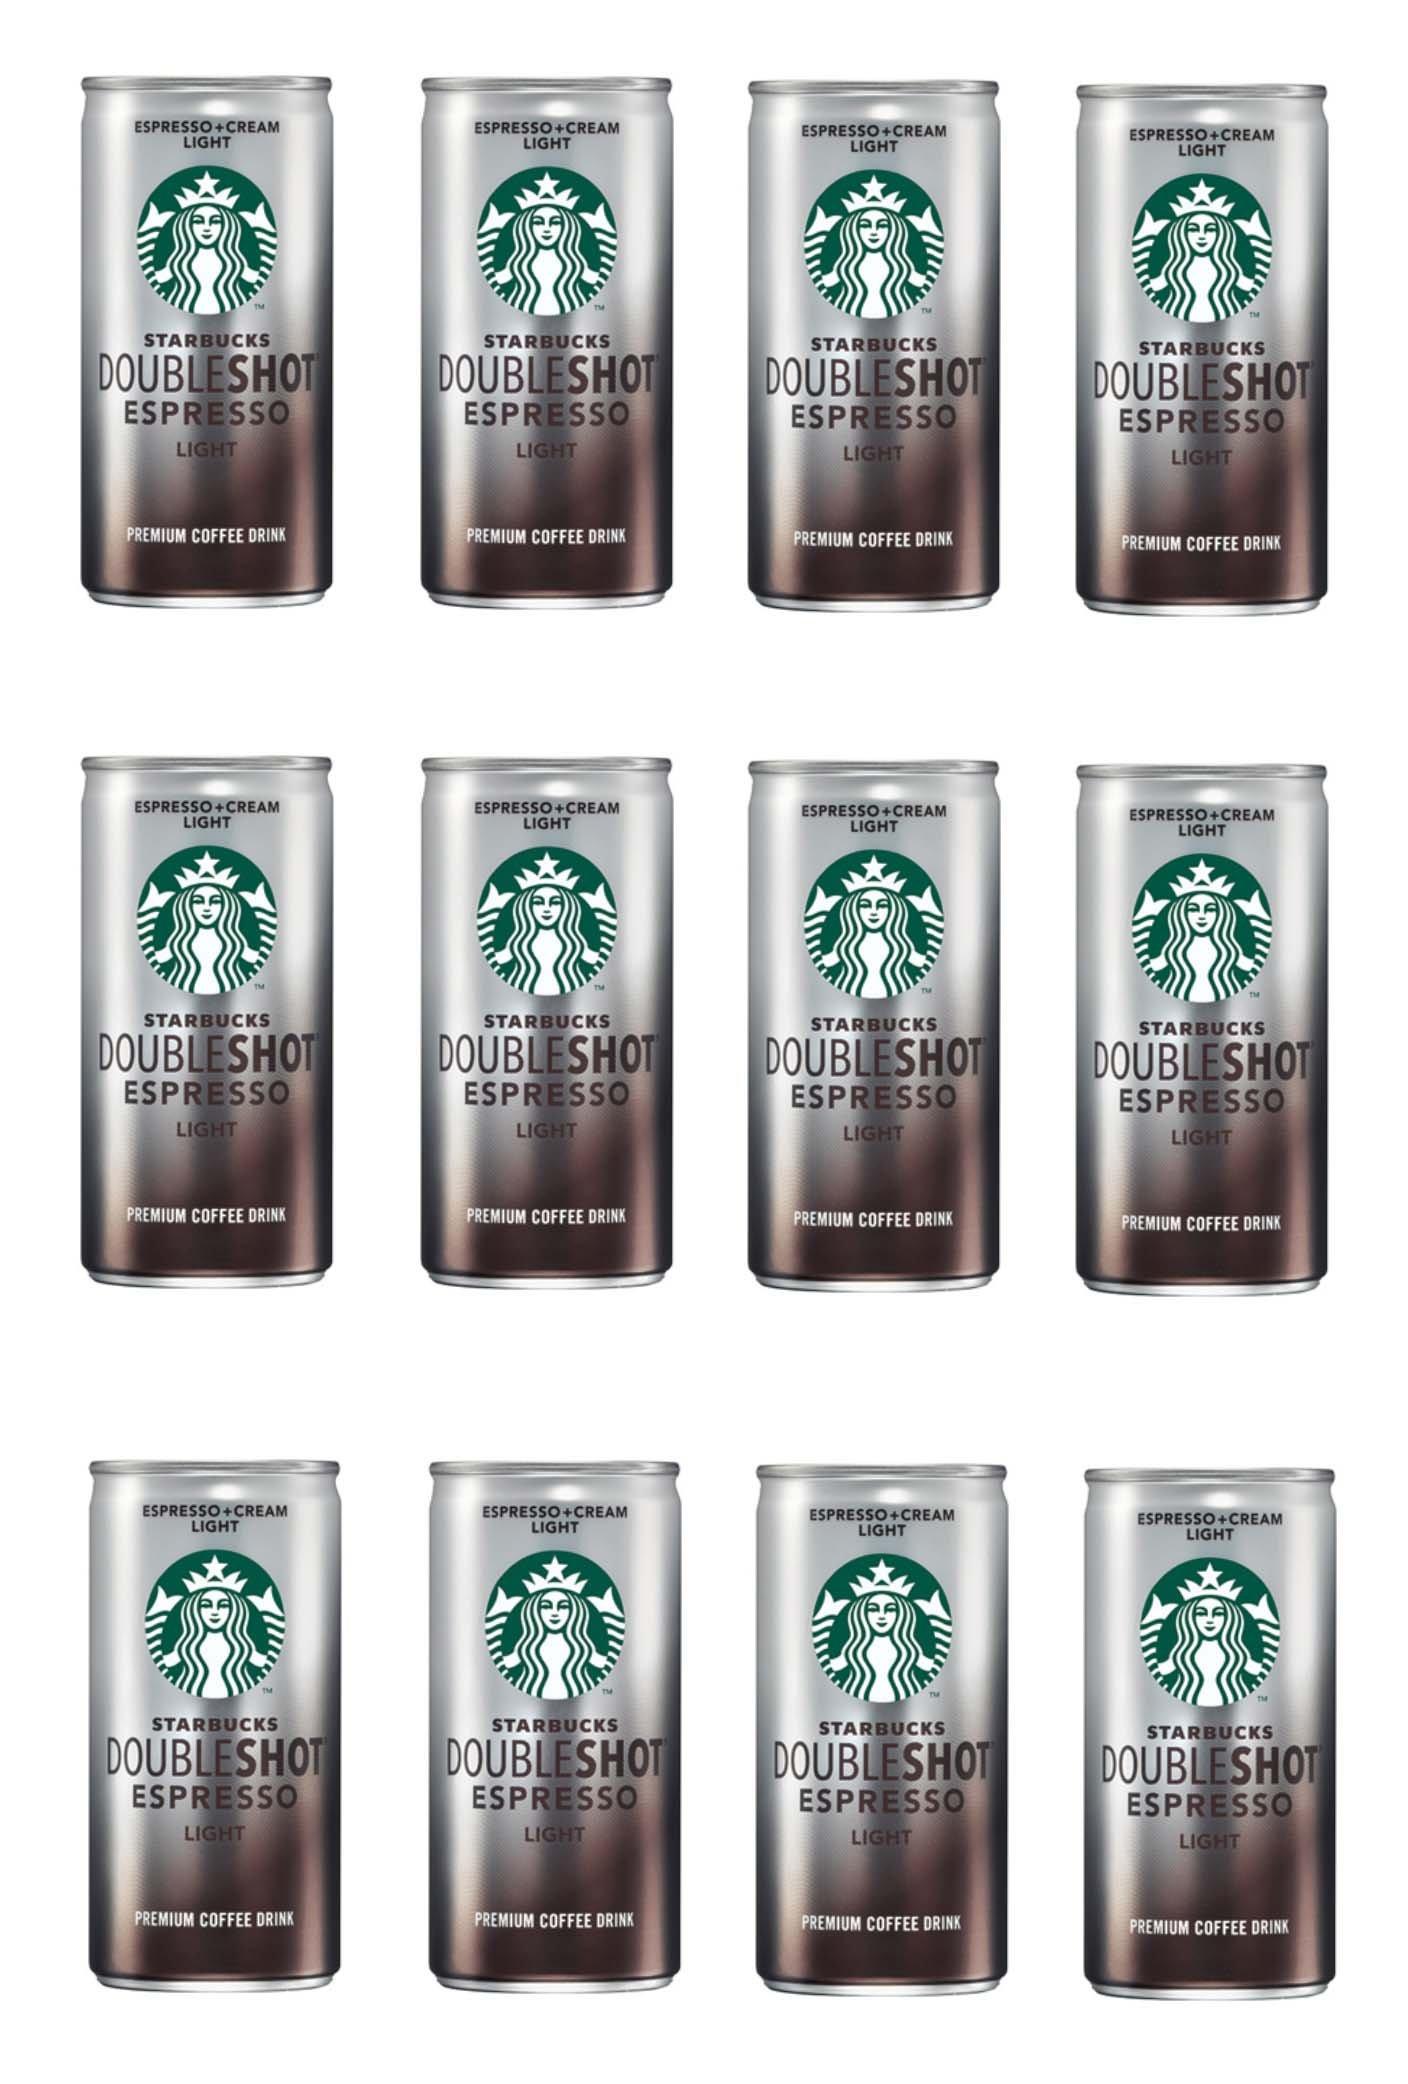 Starbucks Doubleshot Light, Espresso & Cream 6.5 oz x 12 Cans